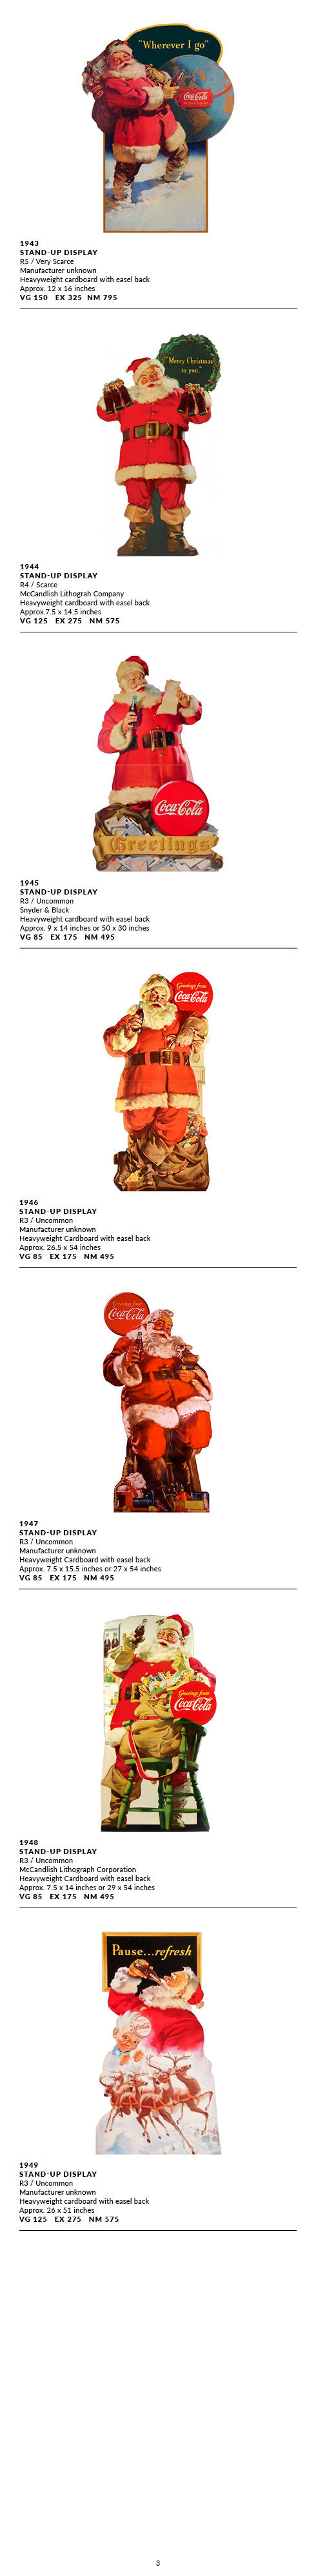 Christmas_3.jpg